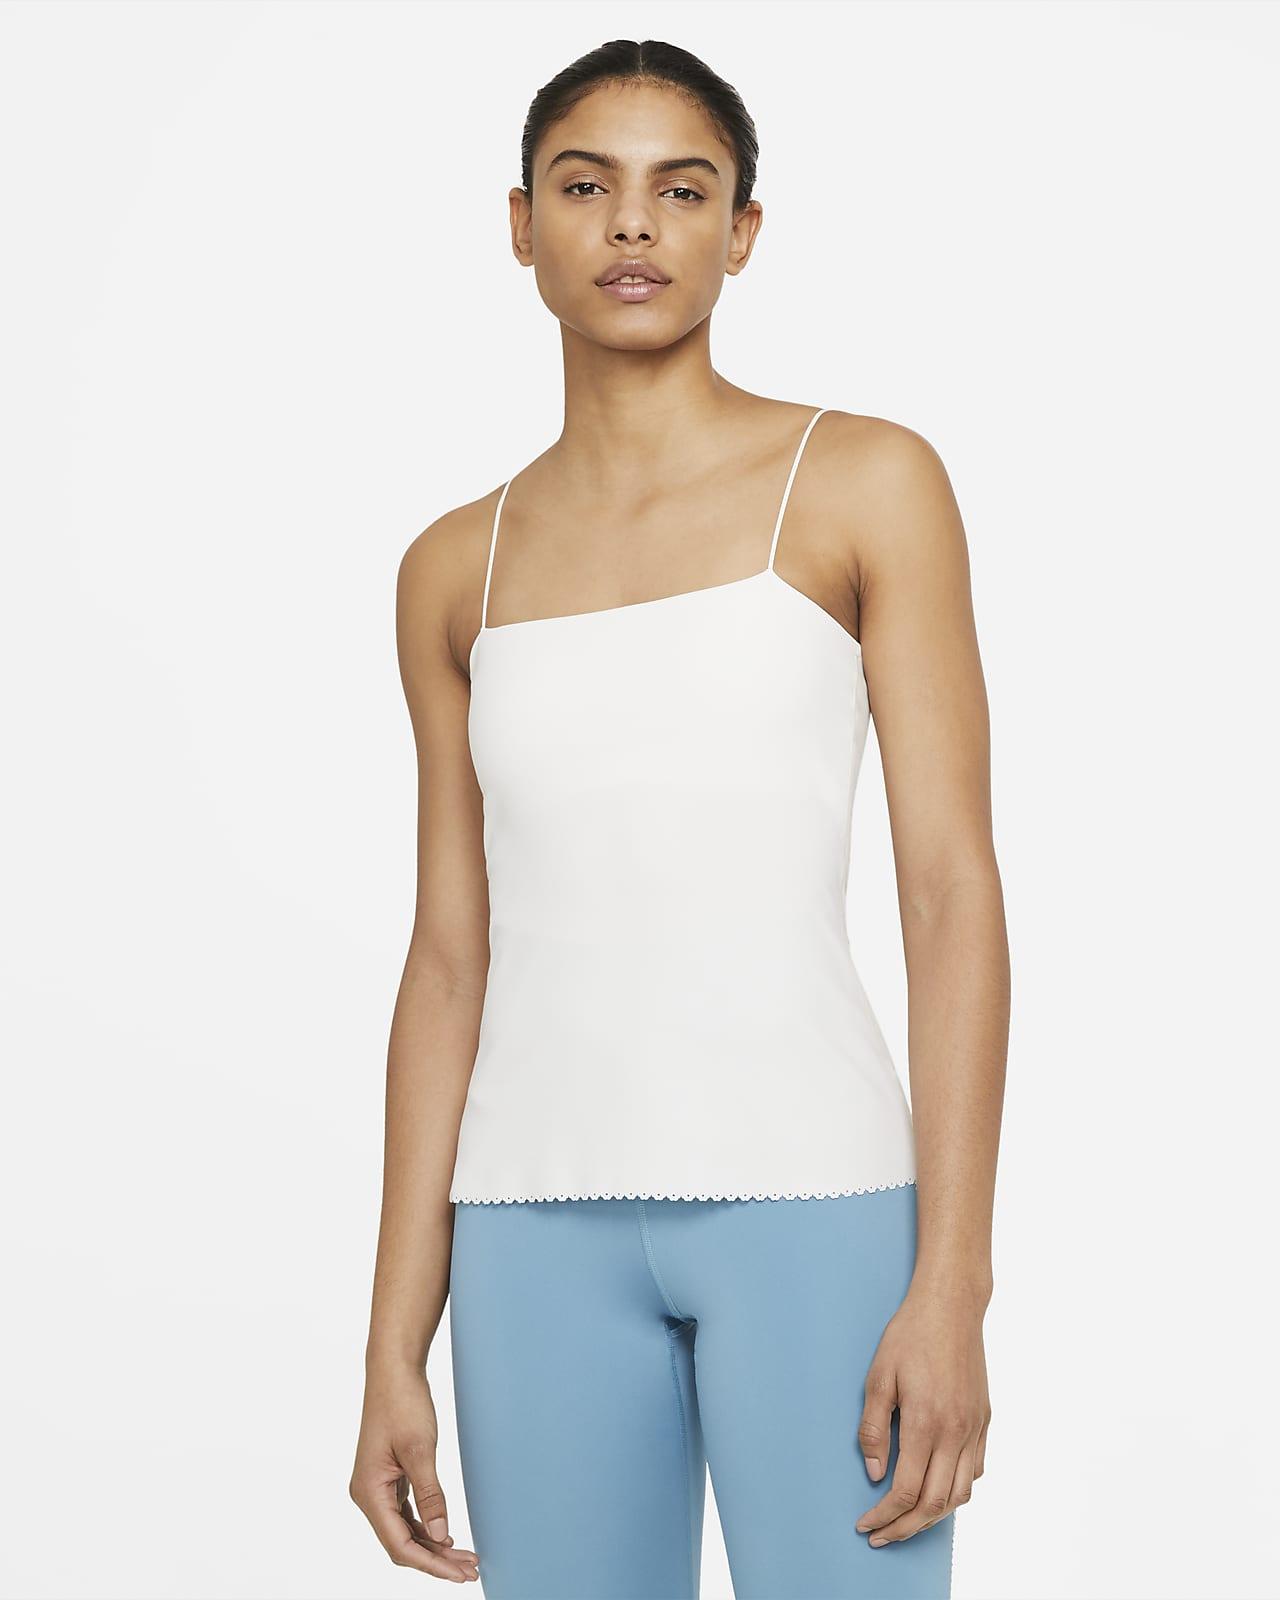 Nike Yoga Luxe Eyelet Women's Shelf-Bra Tank